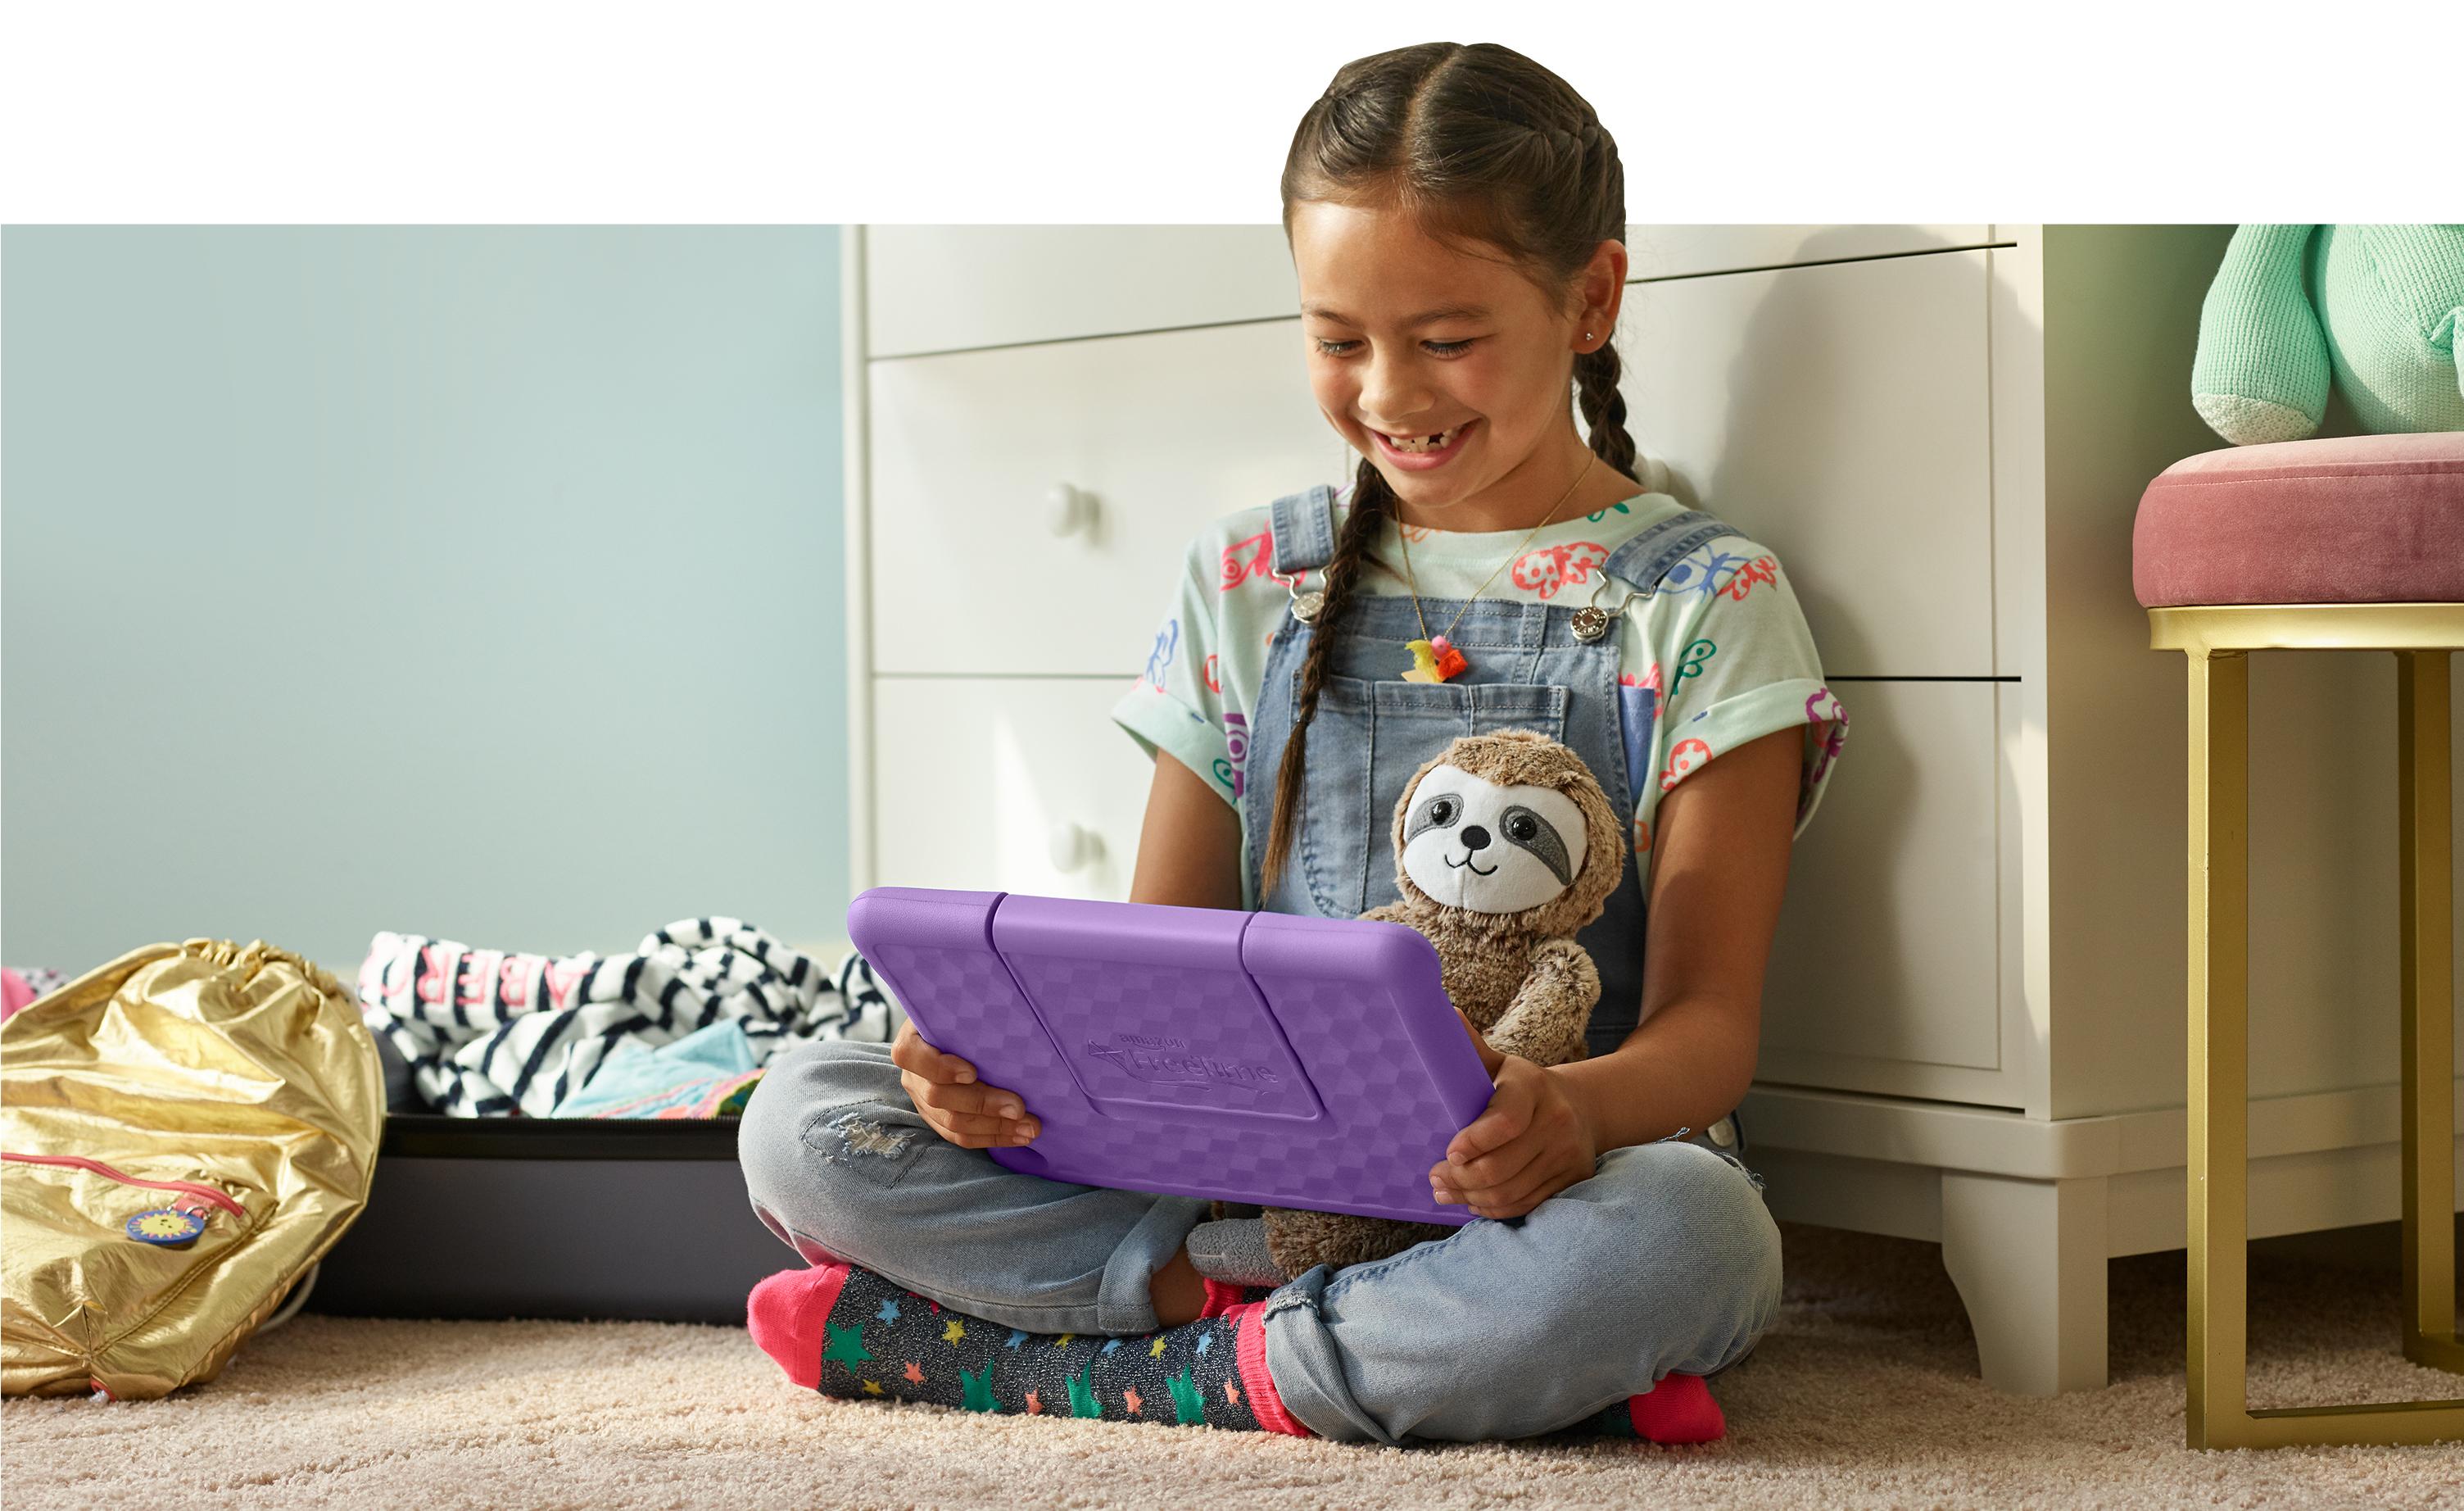 Amazon-Kinder-Tablet